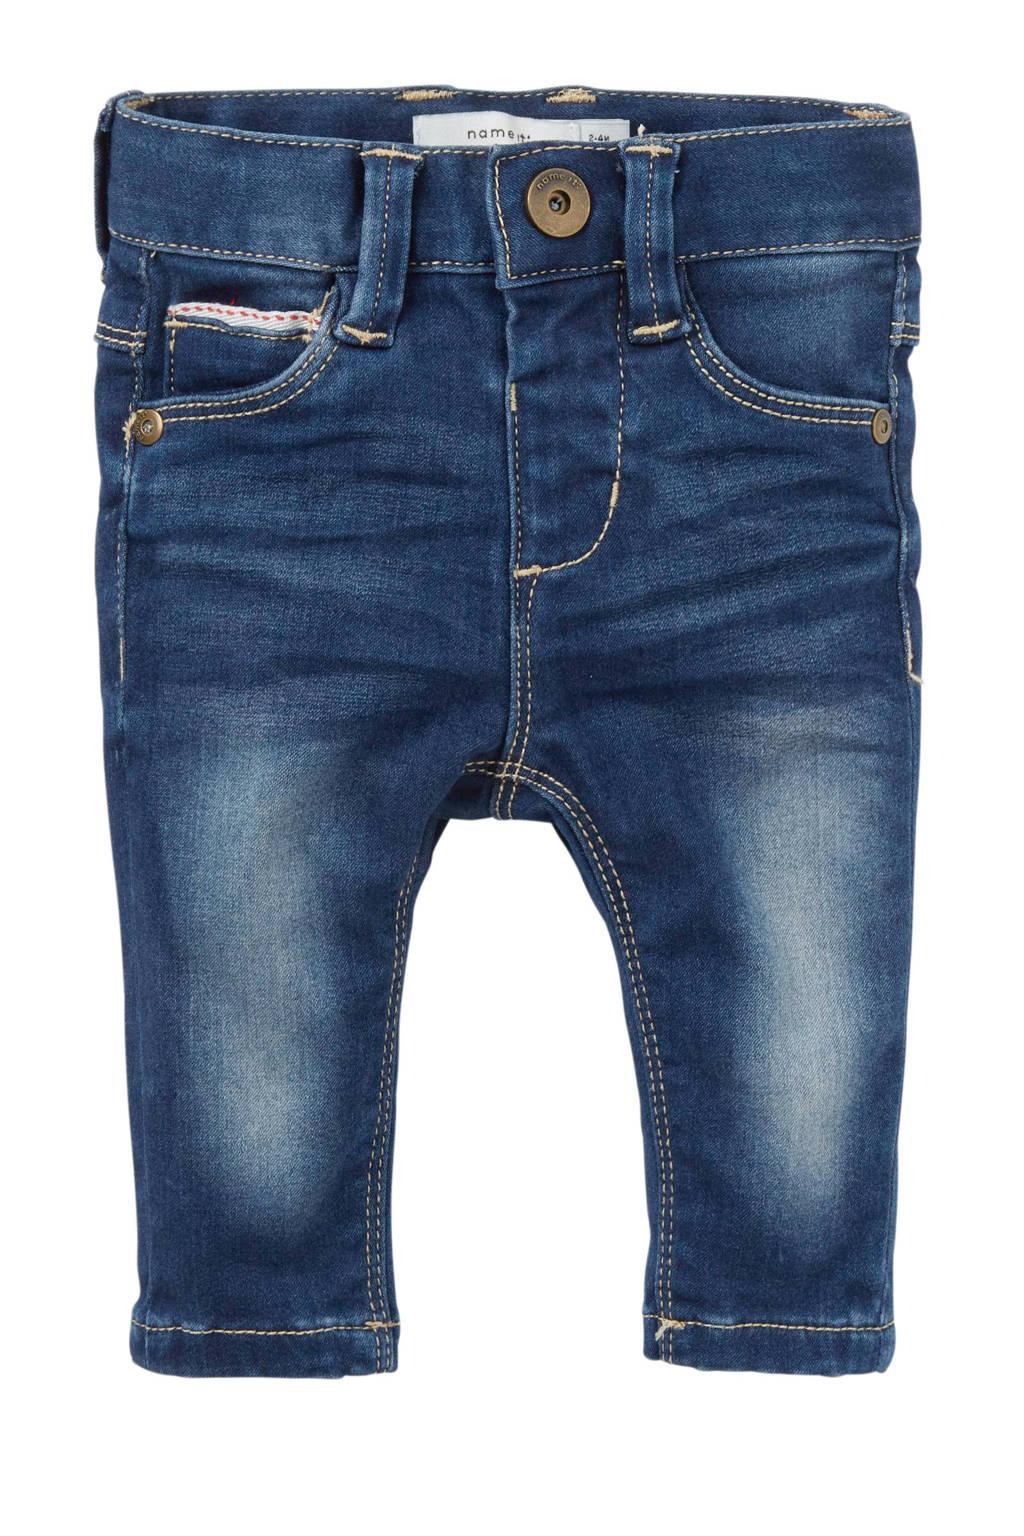 name it BABY baby newborn slim fit jeans Sofus, Dark stonewashed